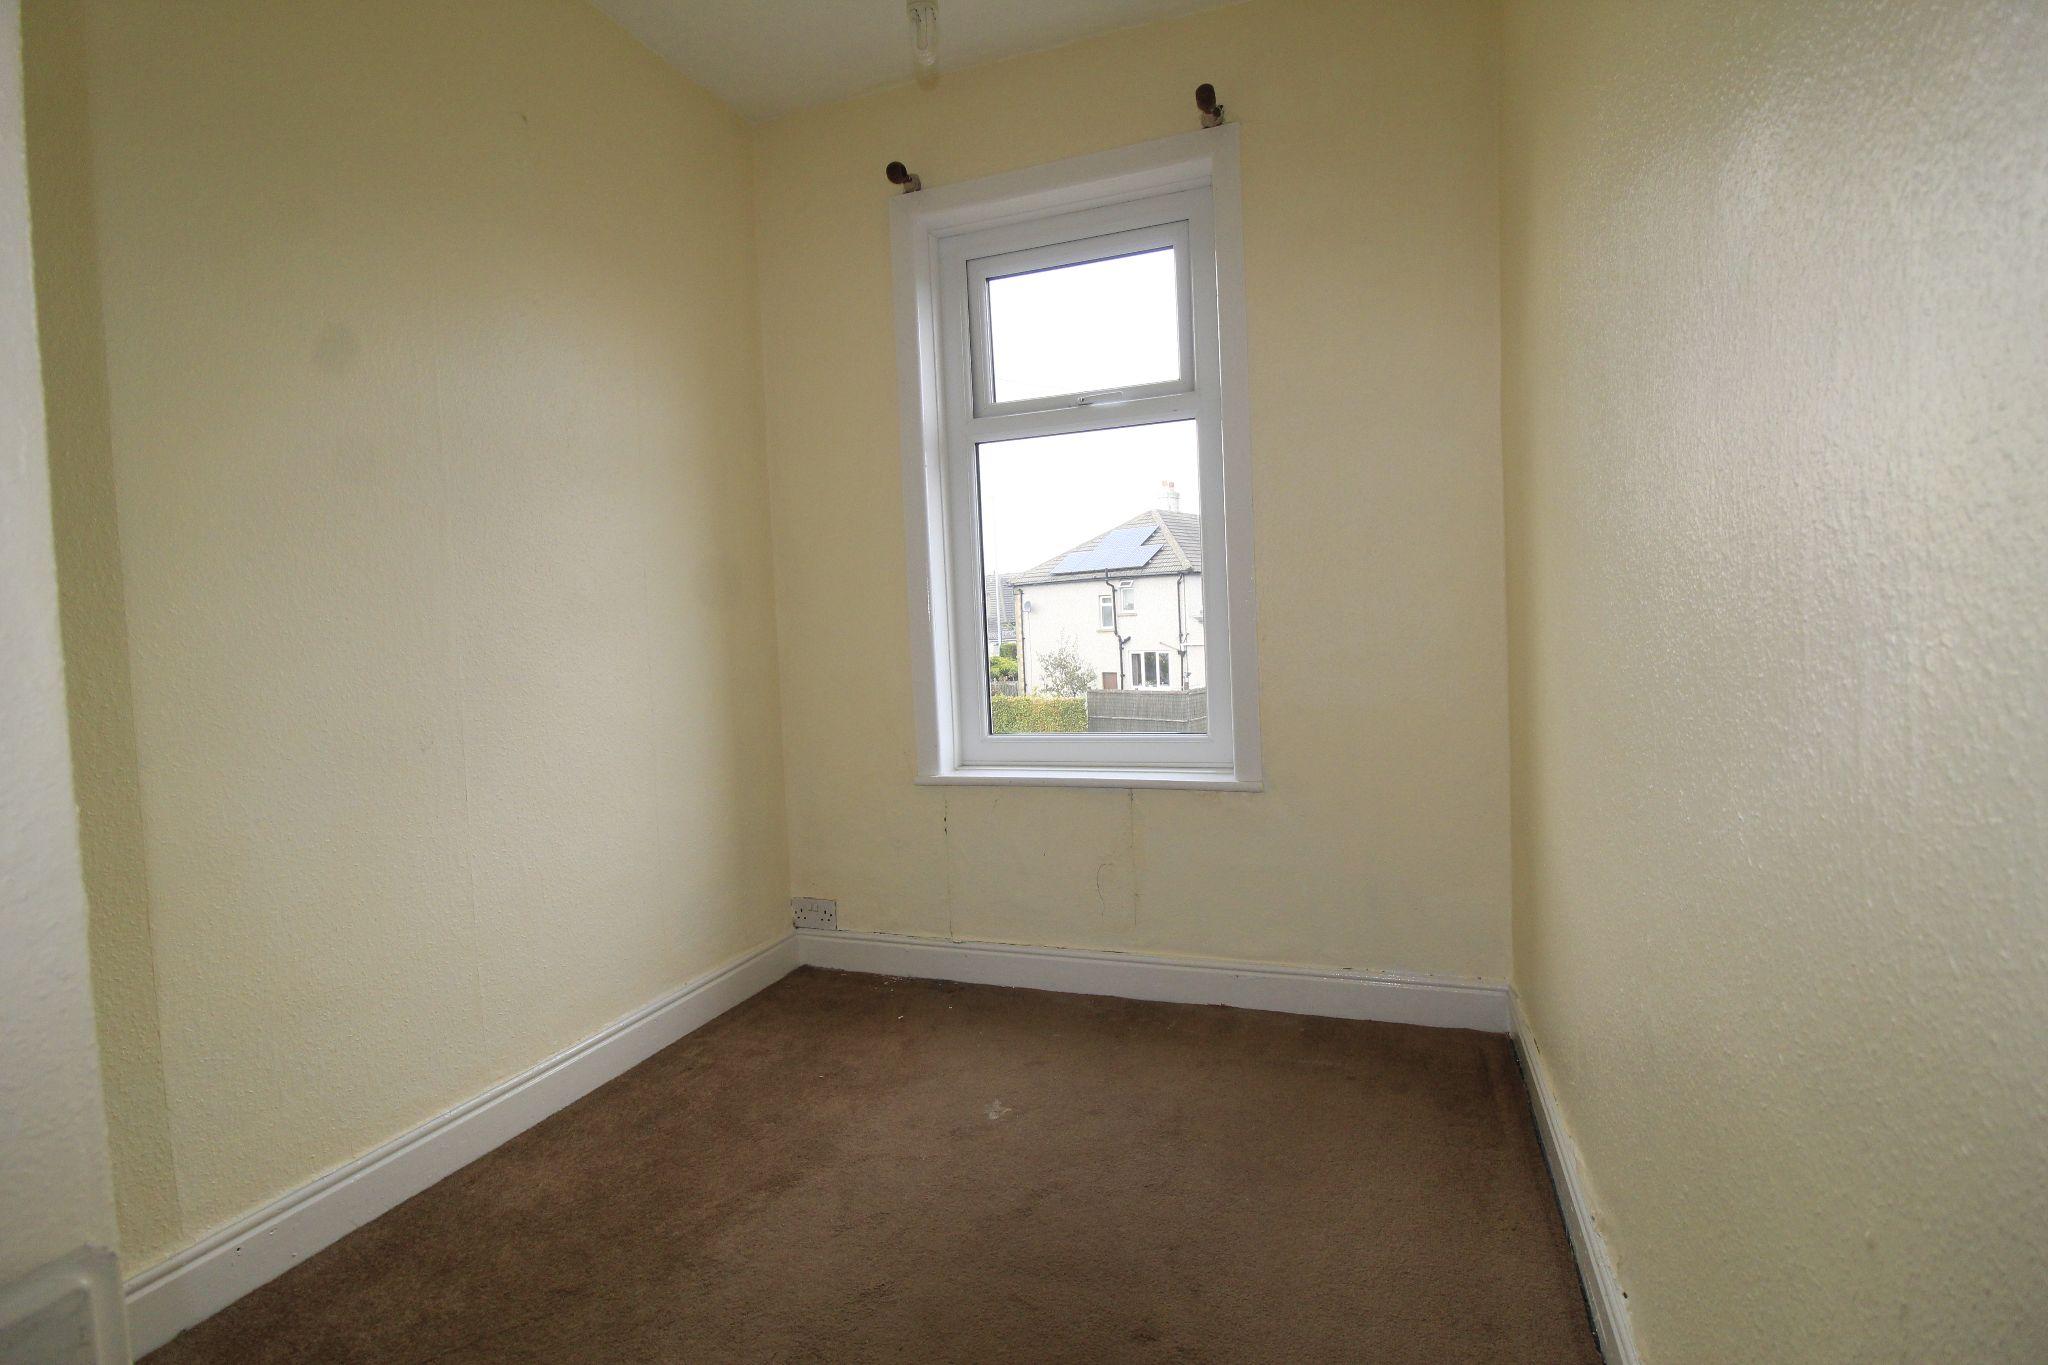 3 bedroom end terraced house To Let in Bradford - Bedroom 3